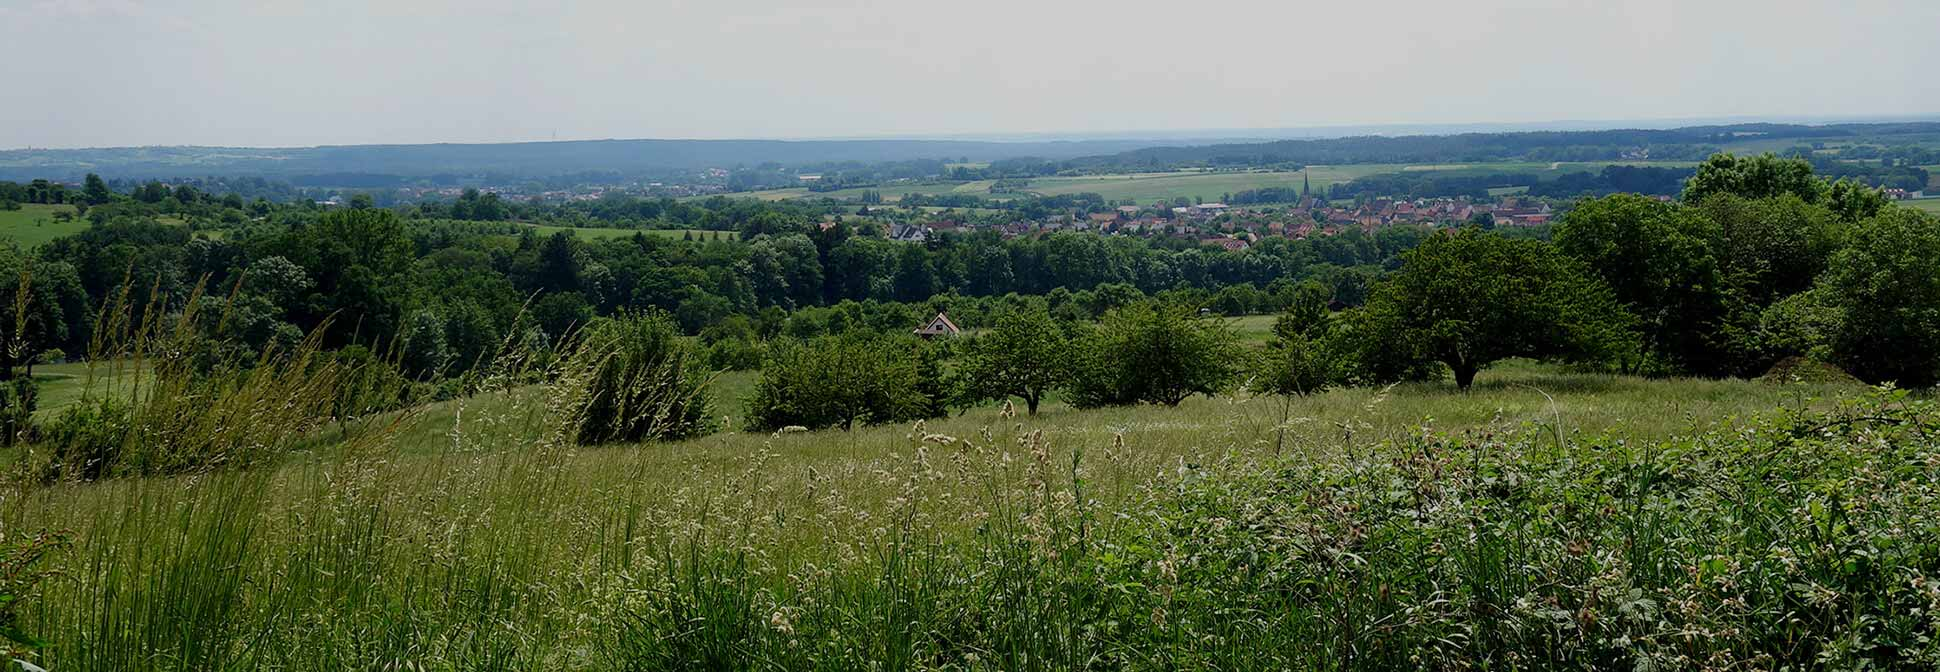 Landschaftsarchitekt Nürnberg